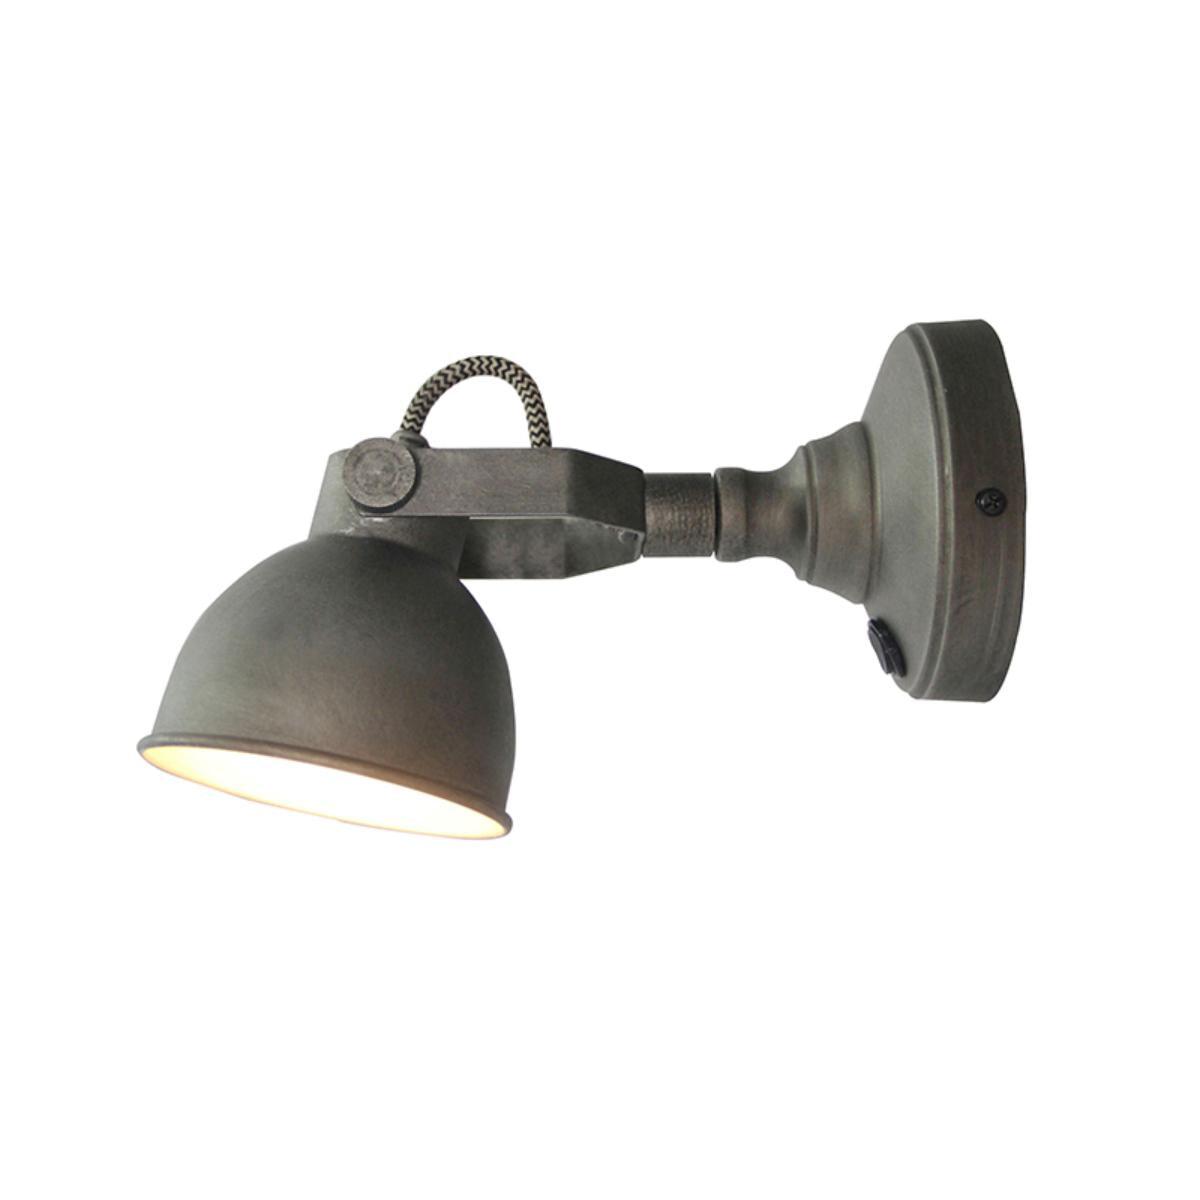 LABEL51 wandlamp 'Led Bow M', kleur Burned Steel